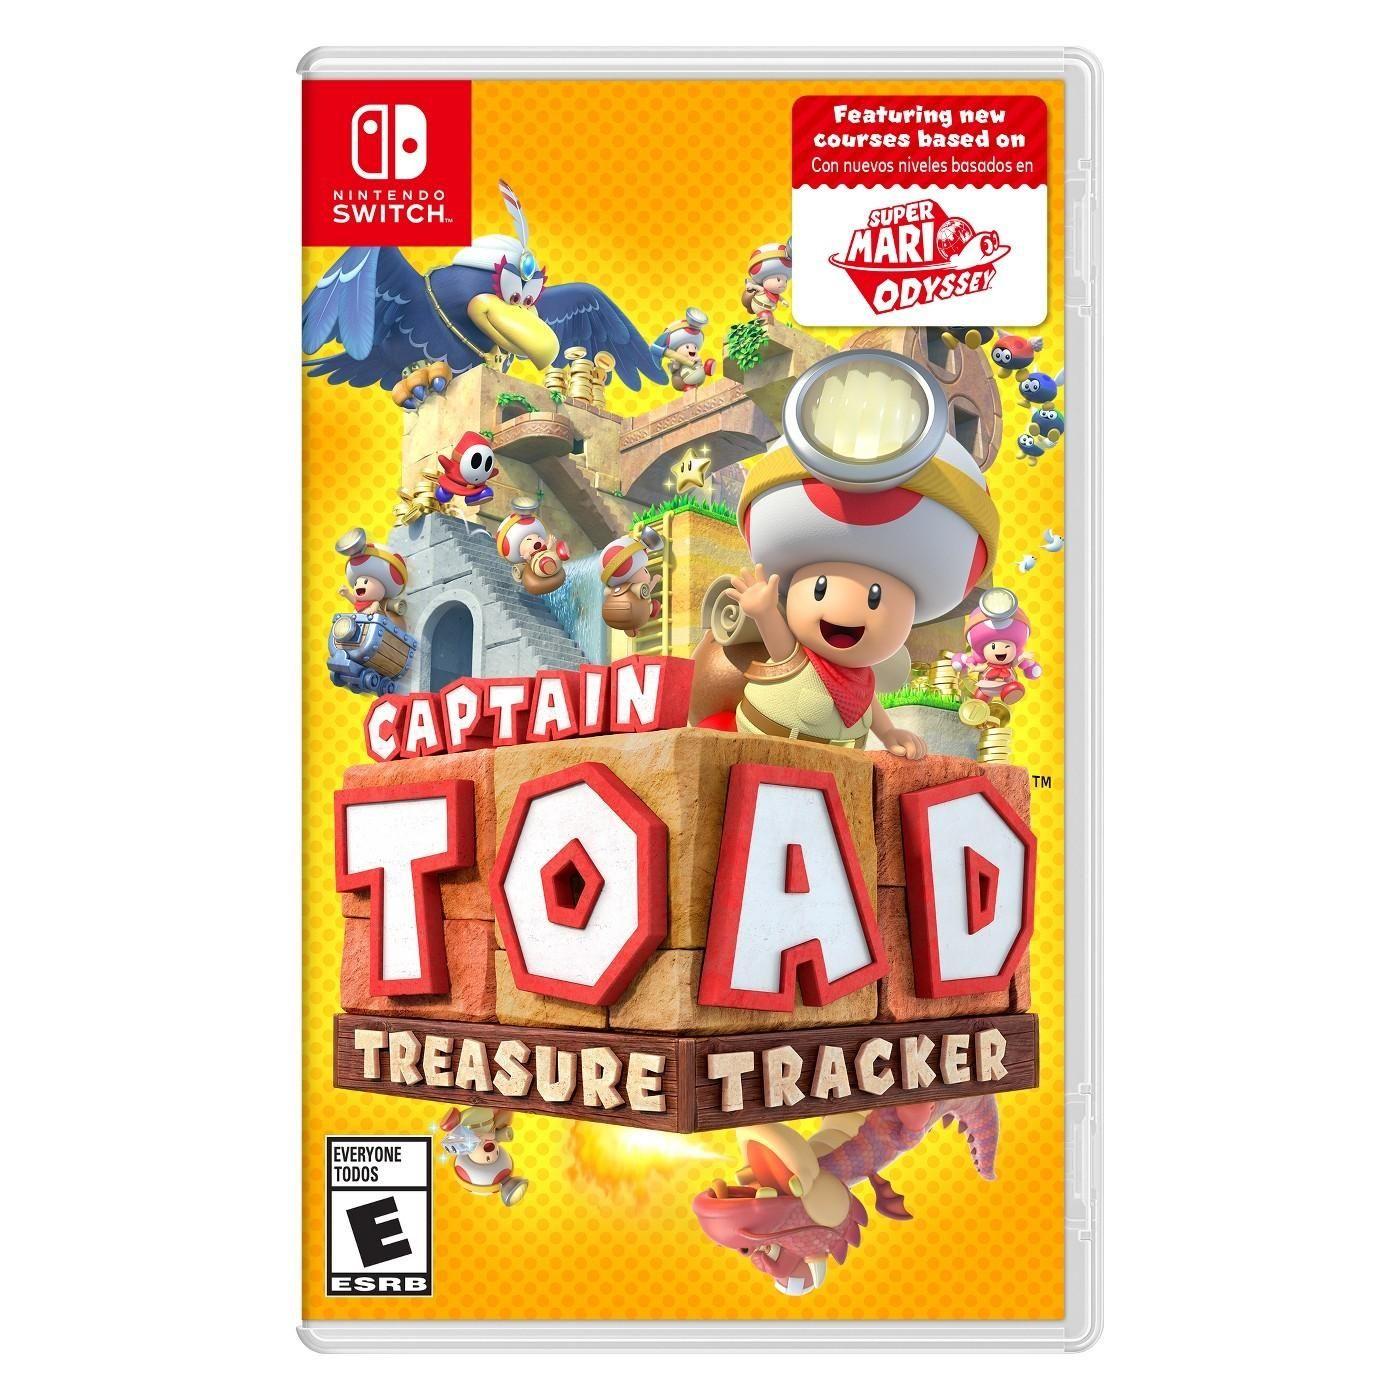 Deals on Nintendo switch games, Nintendo, Nintendo switch